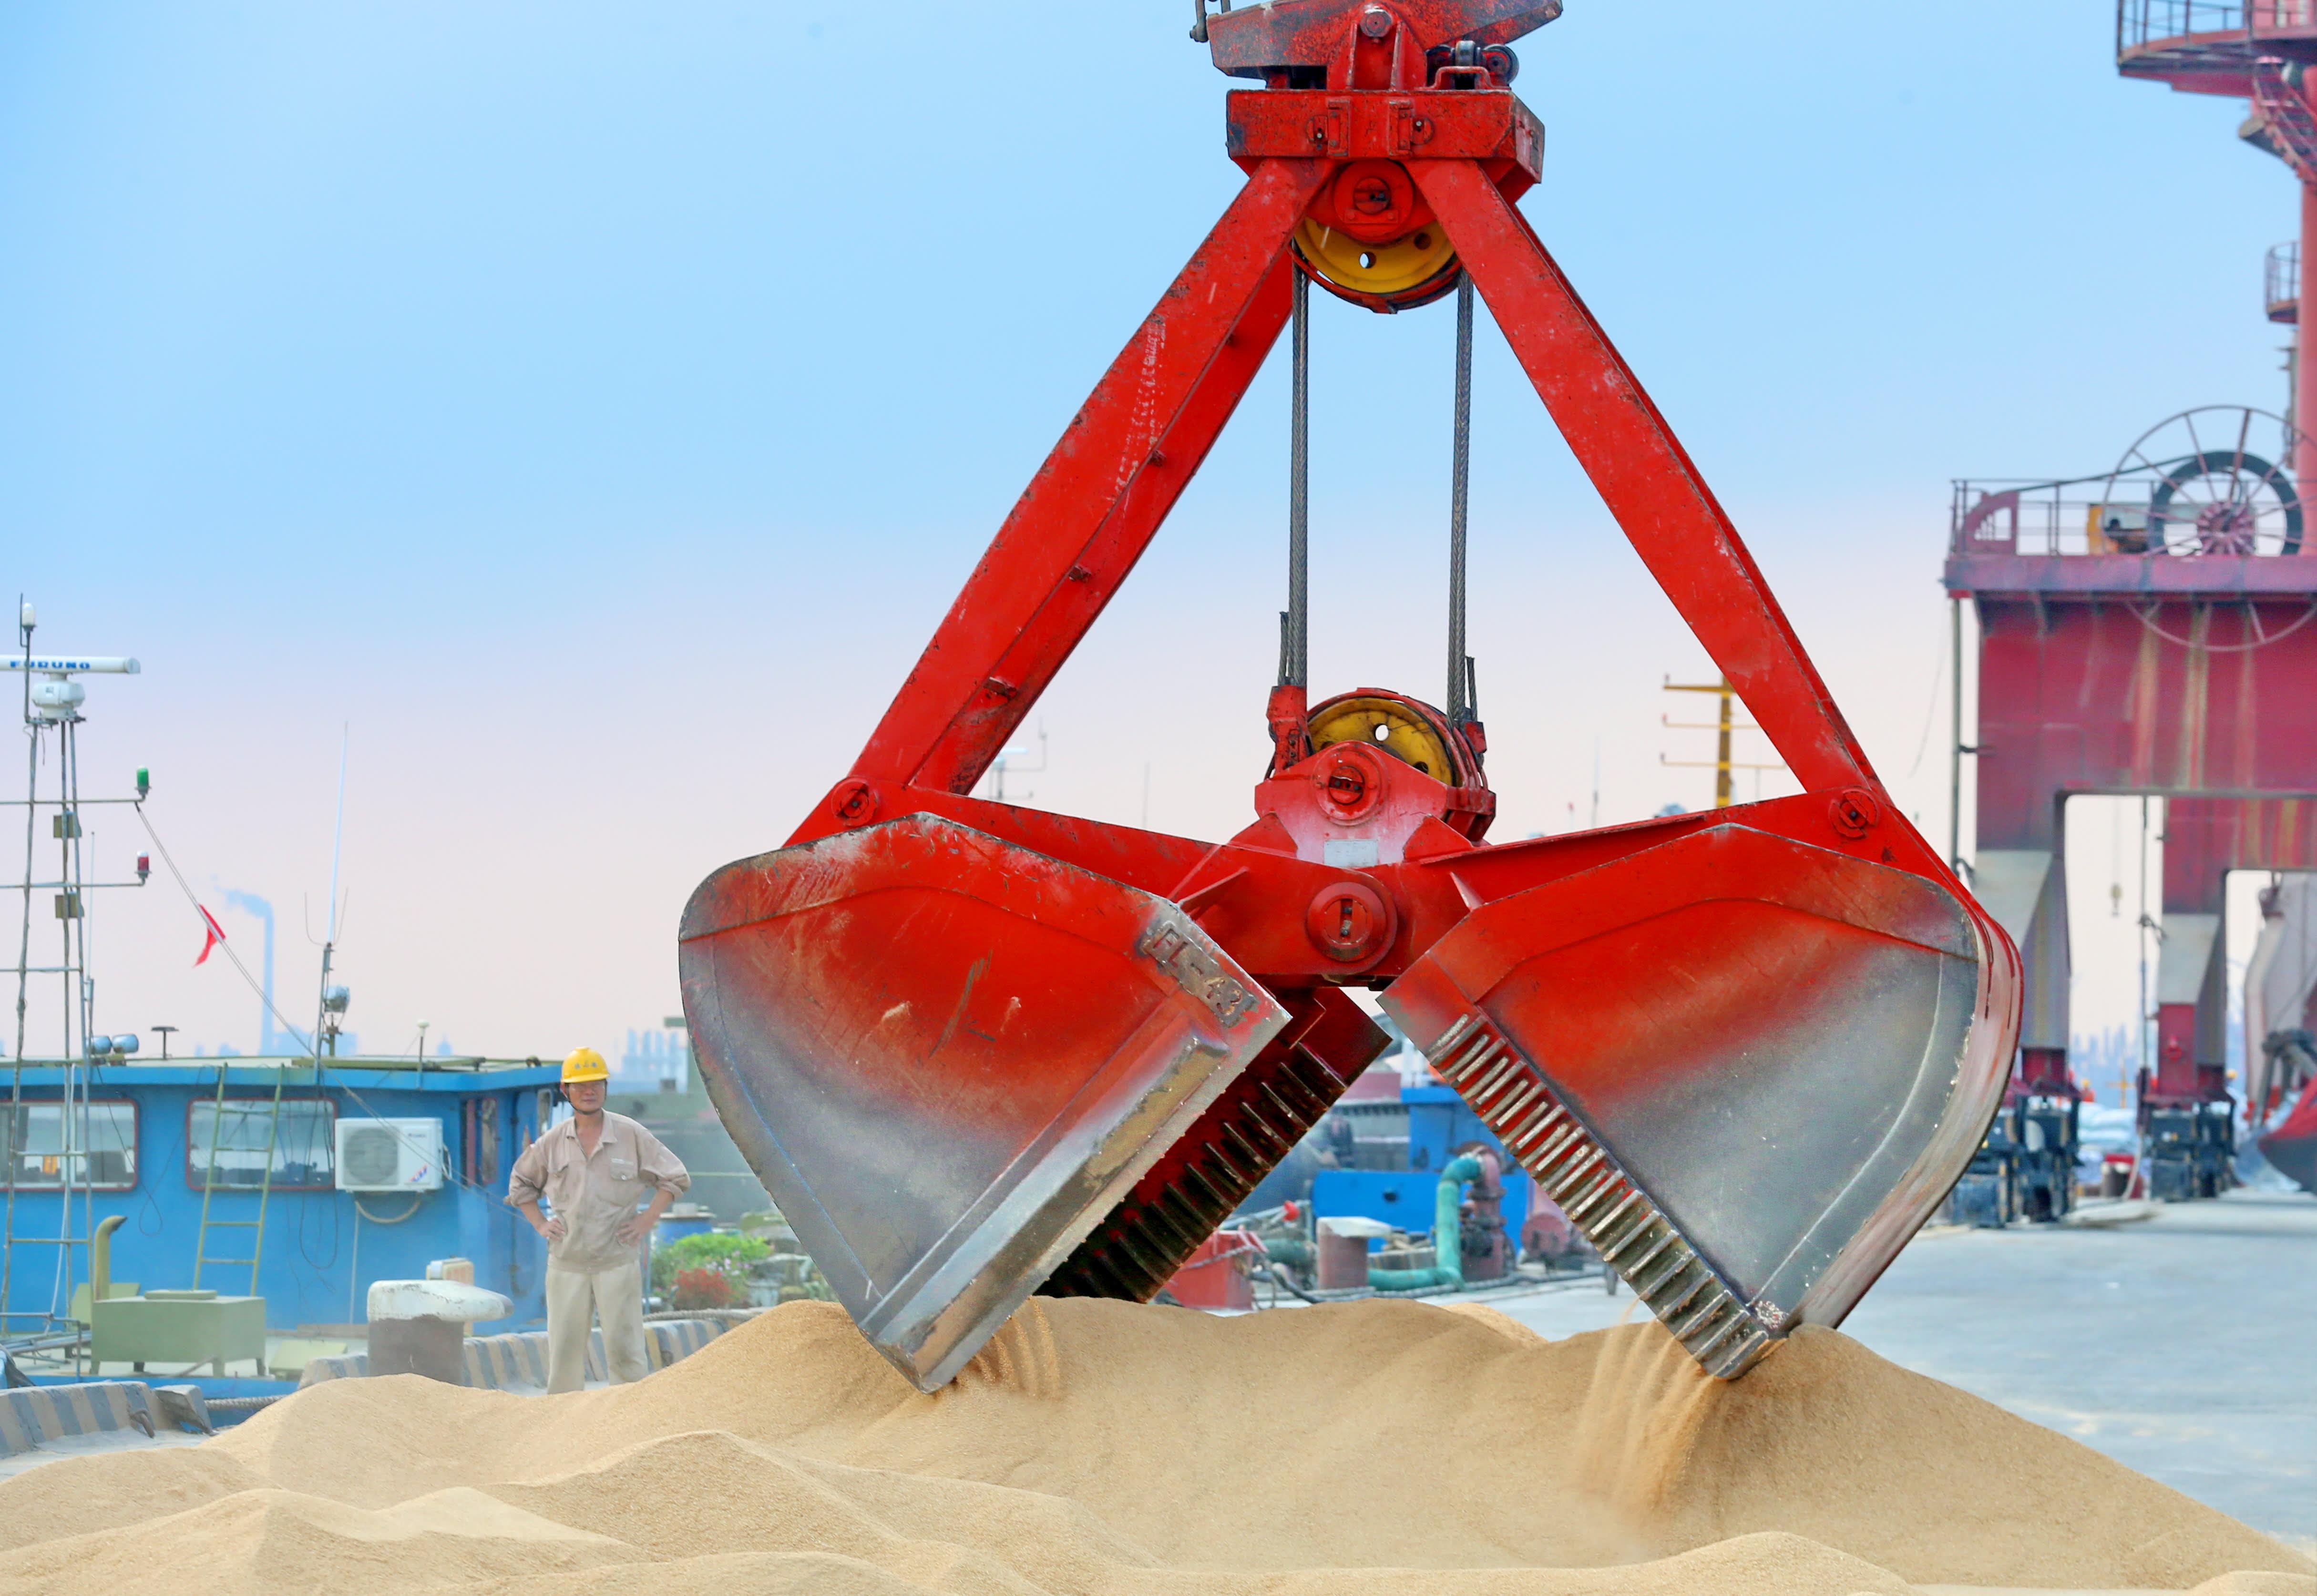 China is raising tariffs on $60 billion of US goods starting June 1